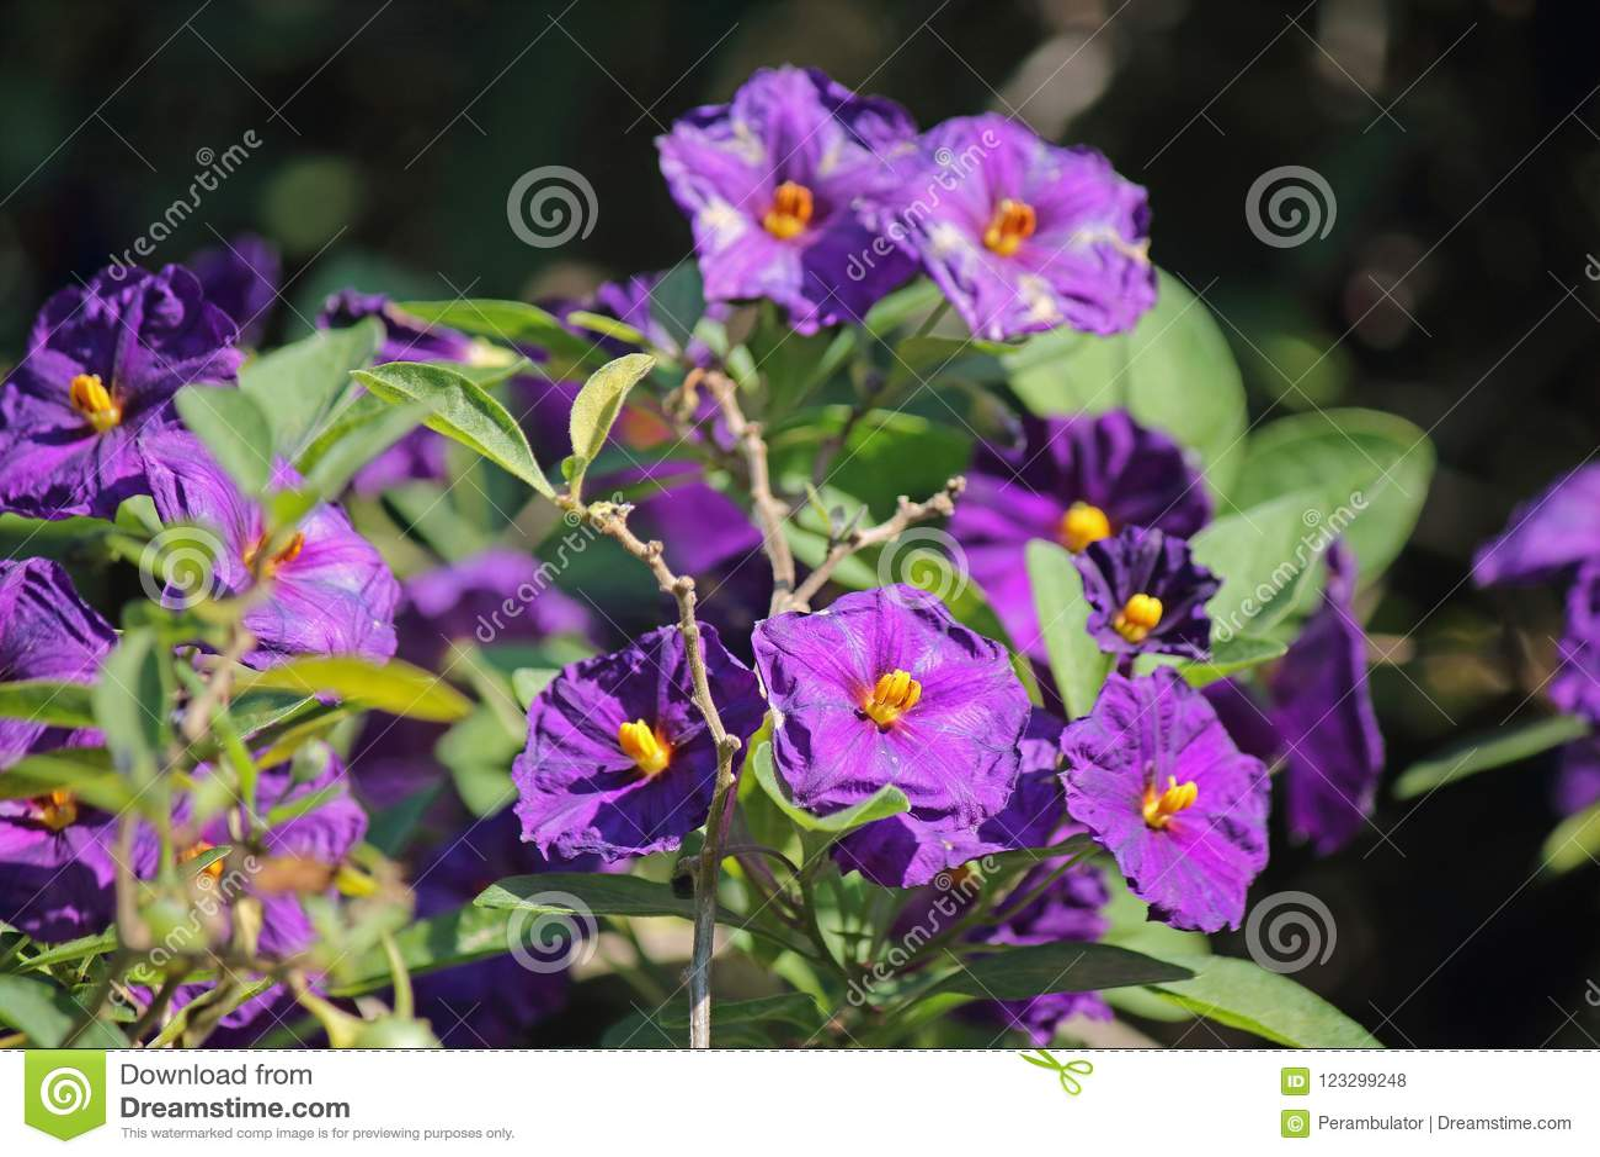 Blue Potato Bush Shrub With Purple Flowers Stock Photo Image Of